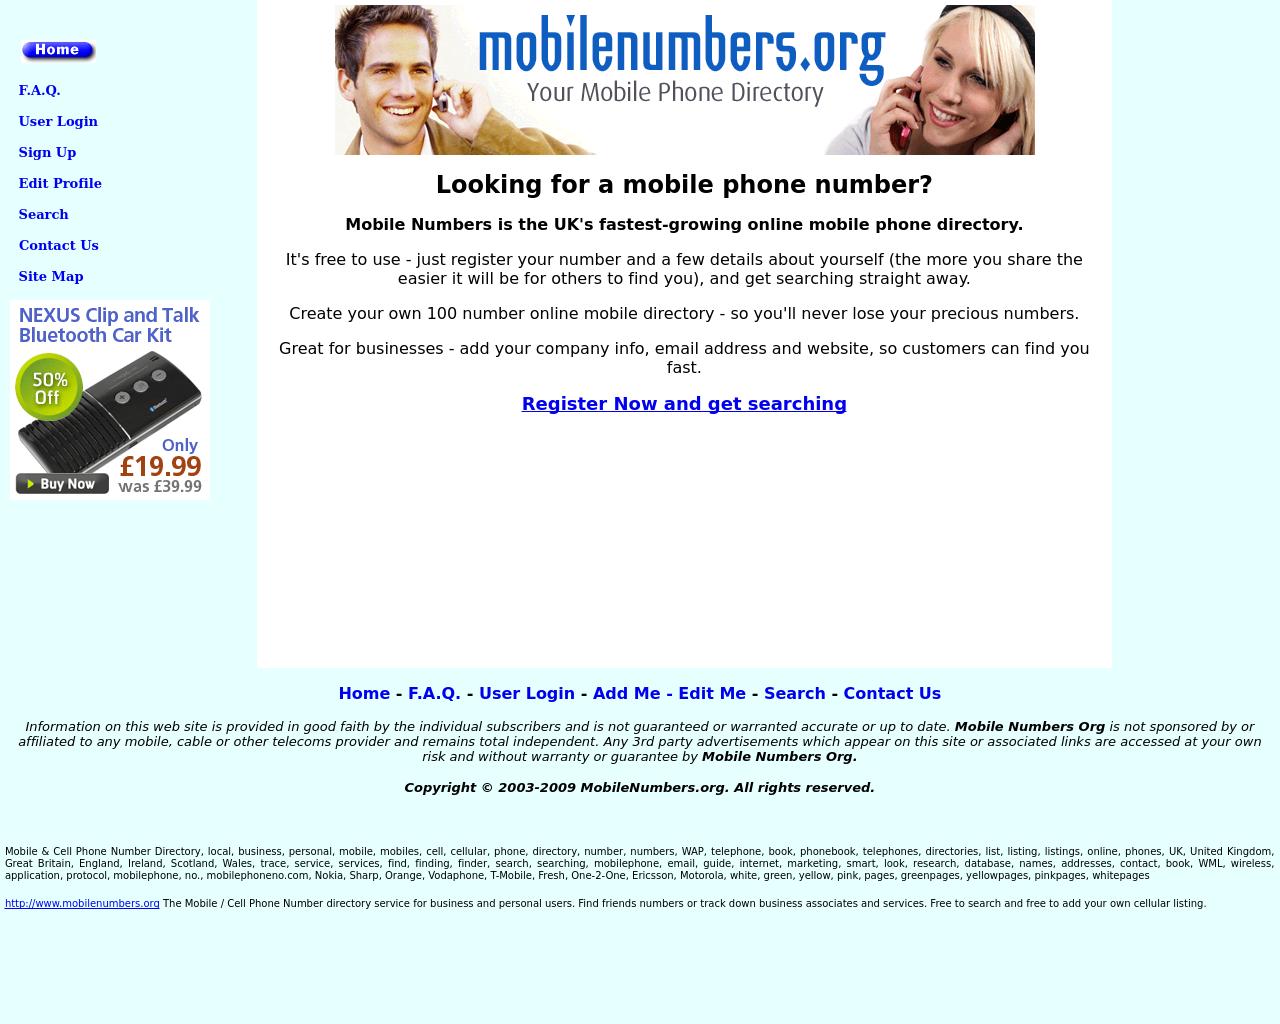 mobilenumbers.org-Advertising-Reviews-Pricing